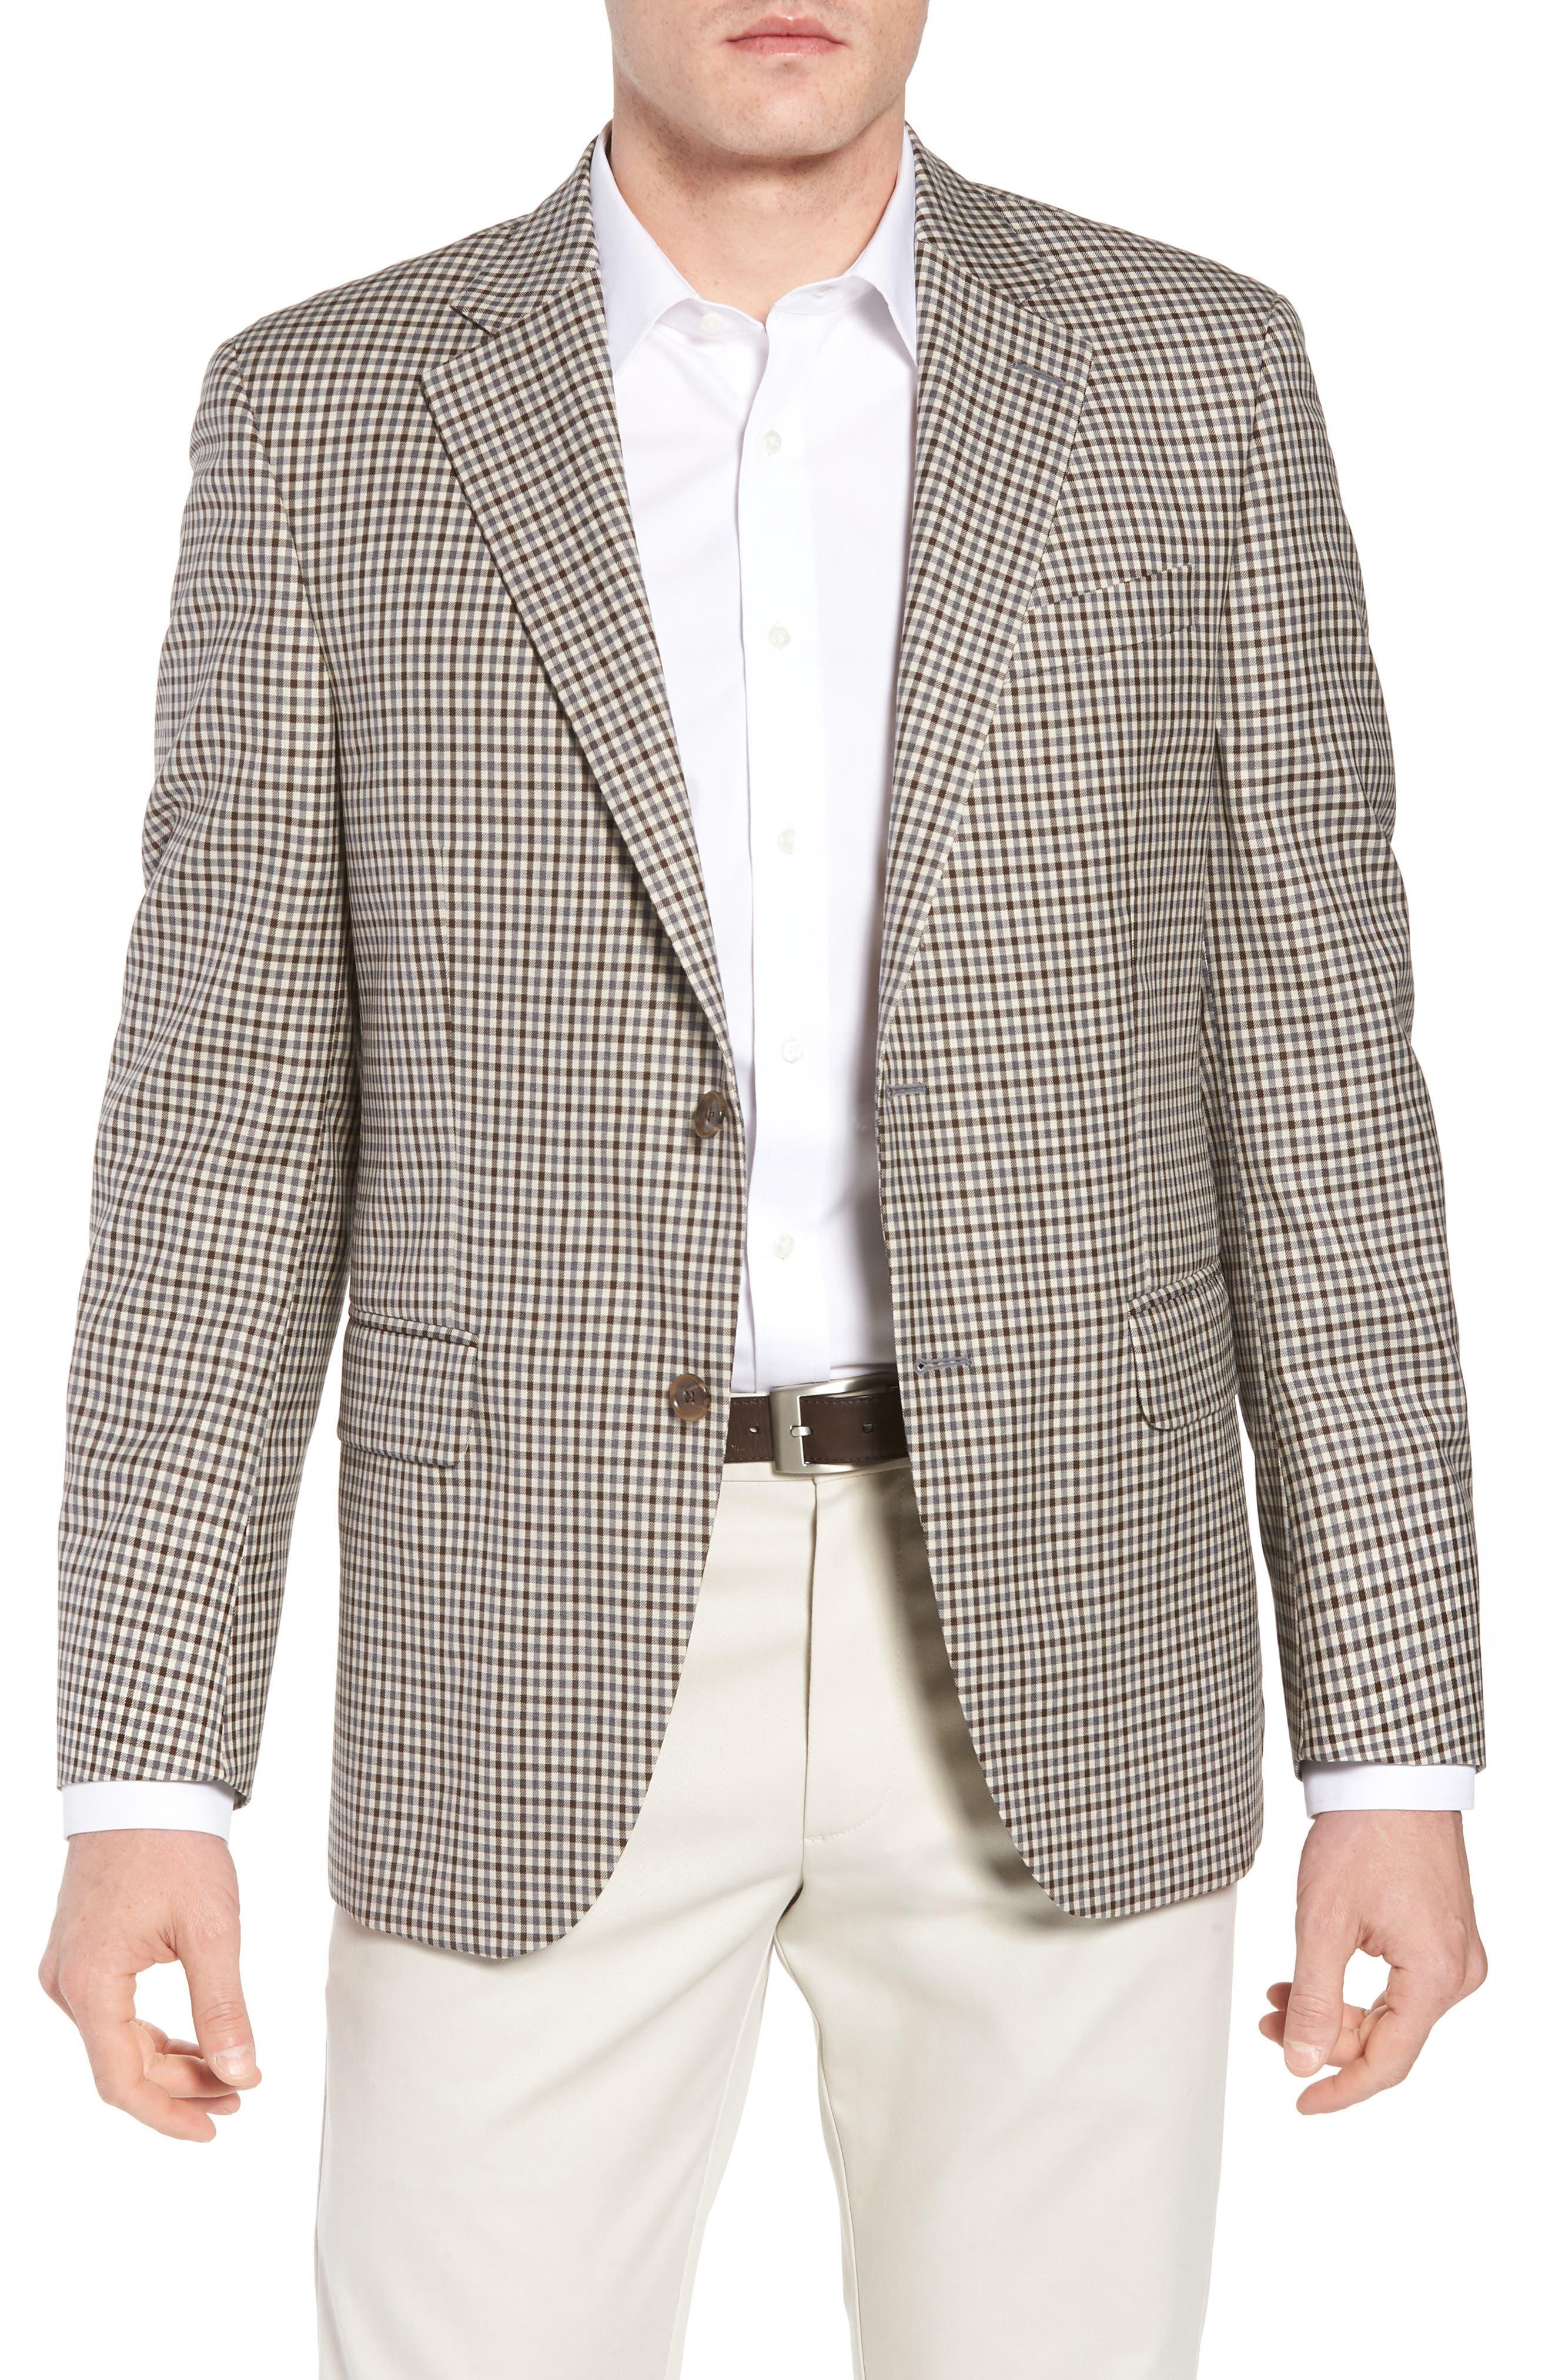 Classic Fit Check Wool Sport Coat,                             Main thumbnail 1, color,                             Tan/Grey